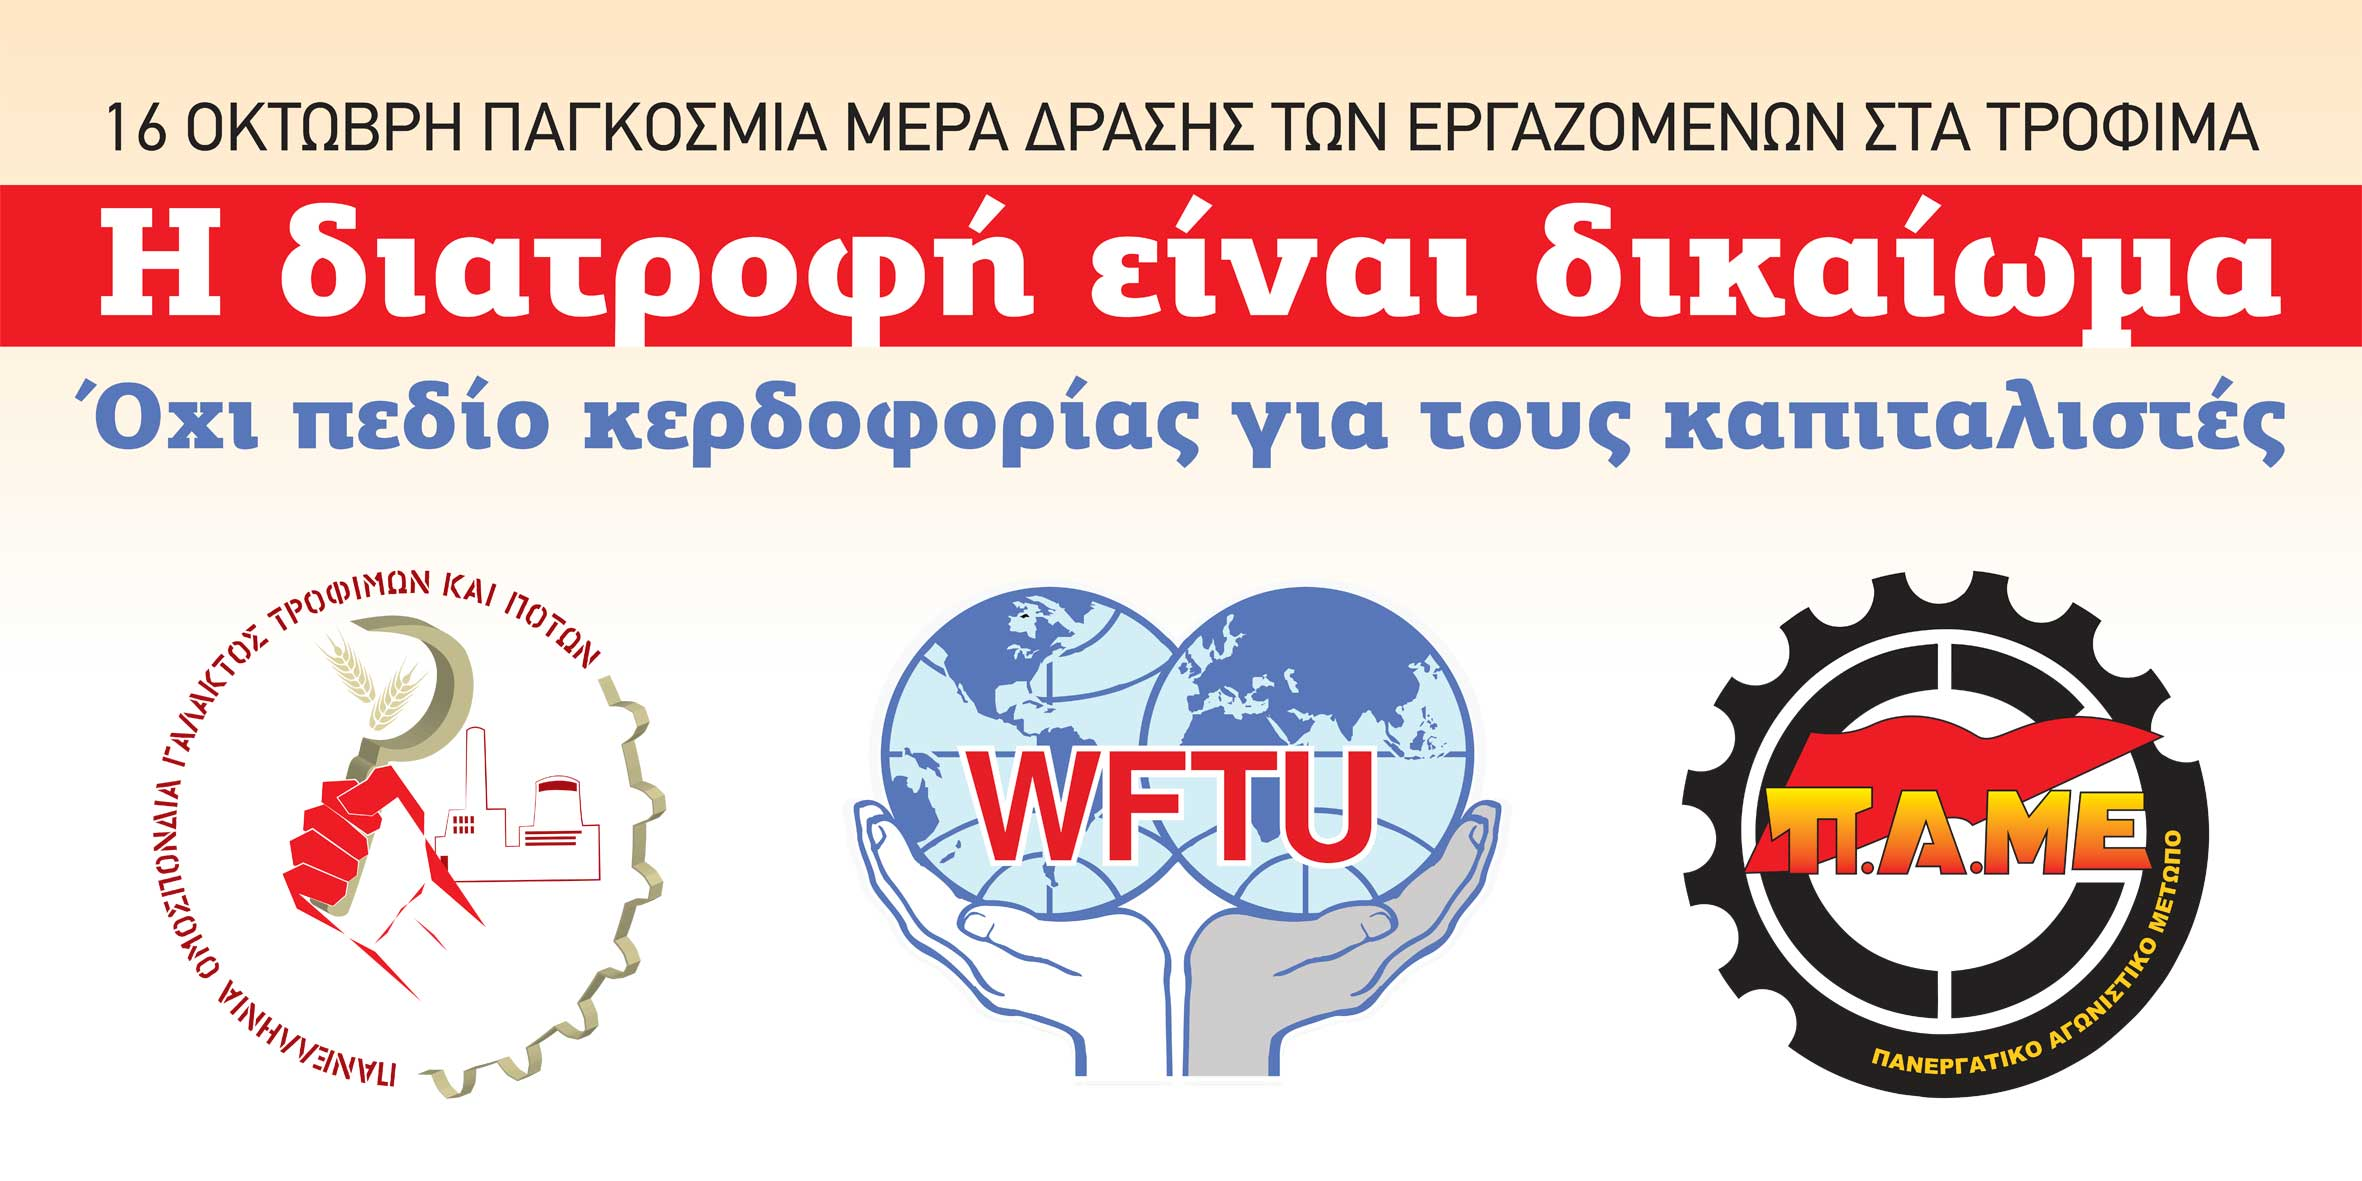 (WFTU ΟΗΕ Παγκόσμια Μέρα Διατροφής